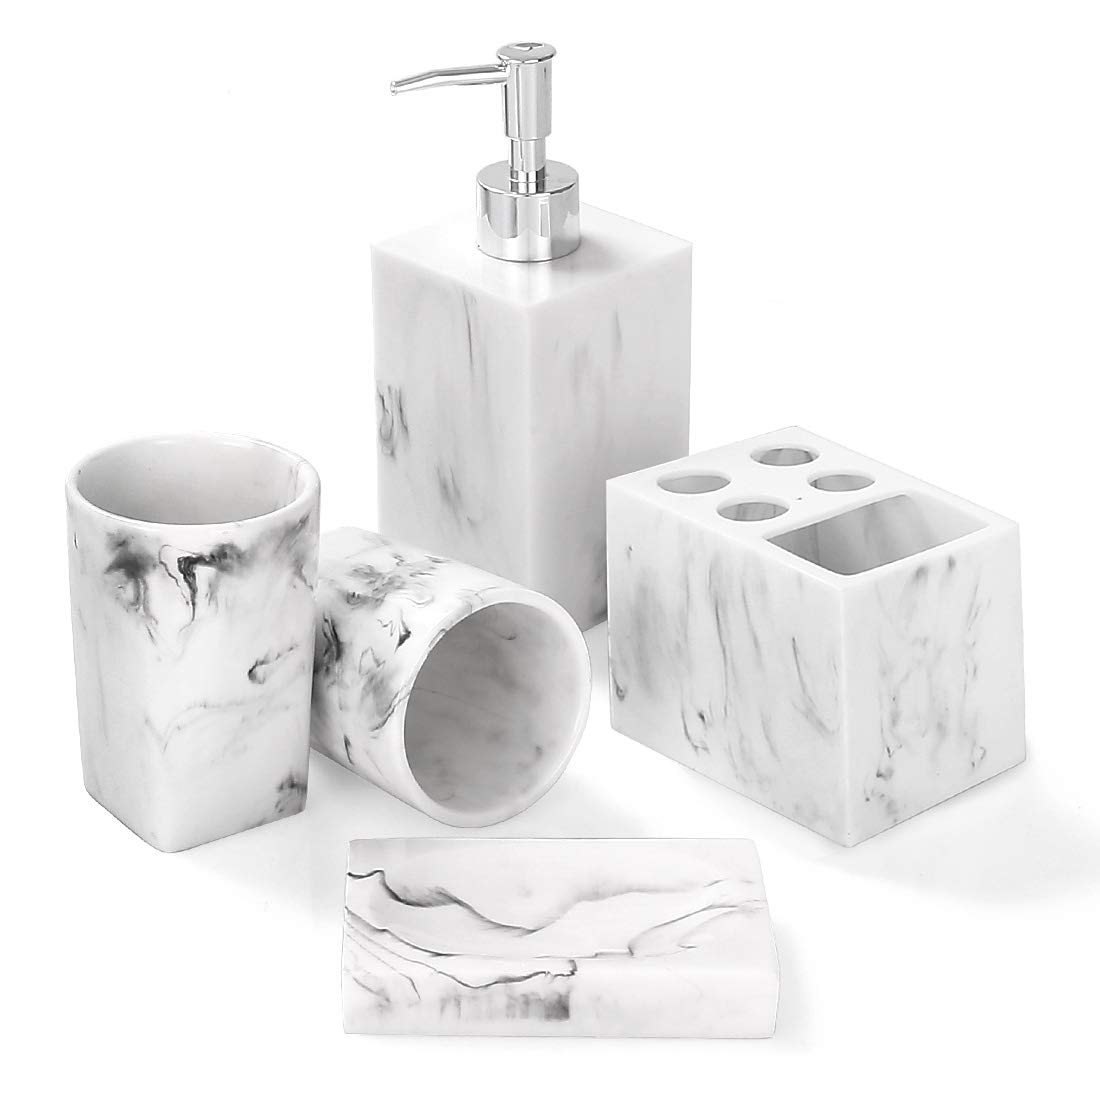 Bathroom Accessories Set, 3 Piece Marble Complete Bathroom Set for